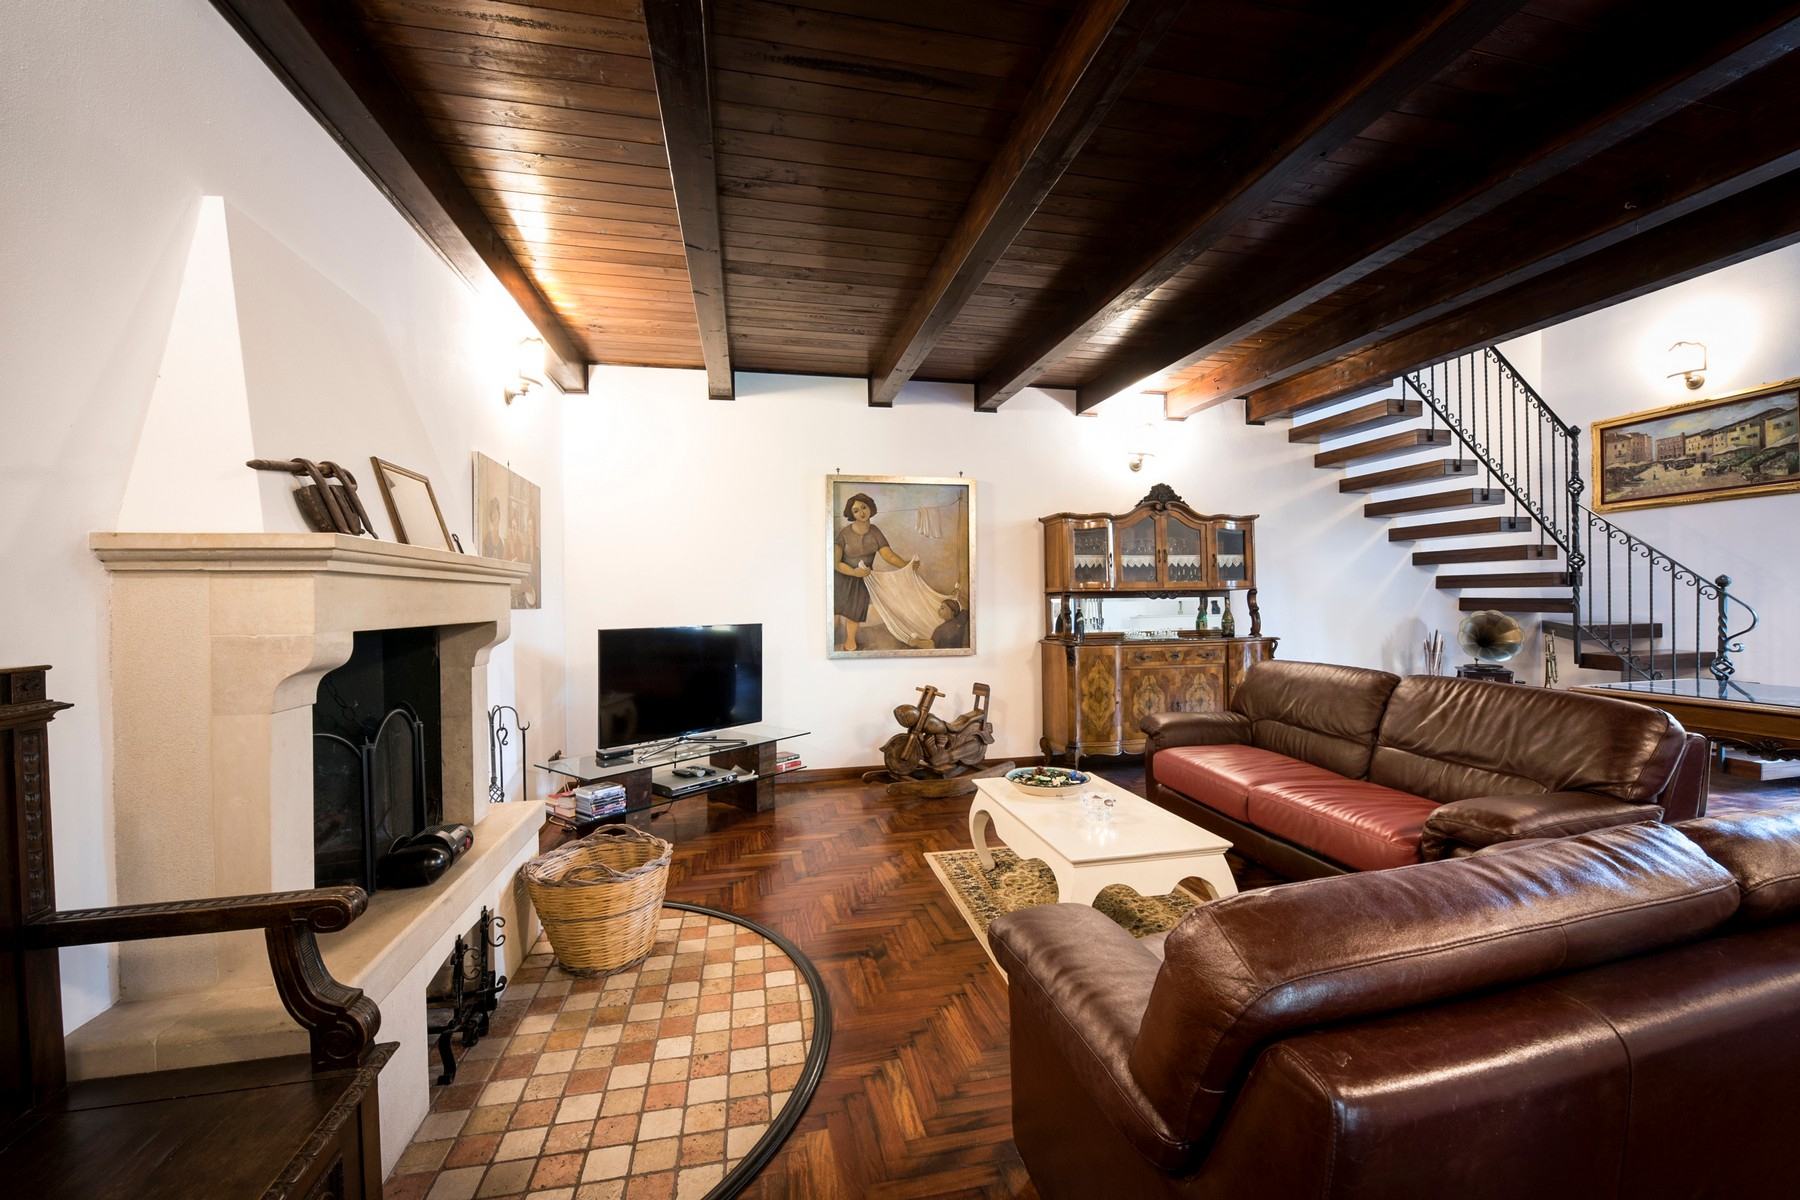 Casa indipendente in Vendita a Noto: 5 locali, 300 mq - Foto 16